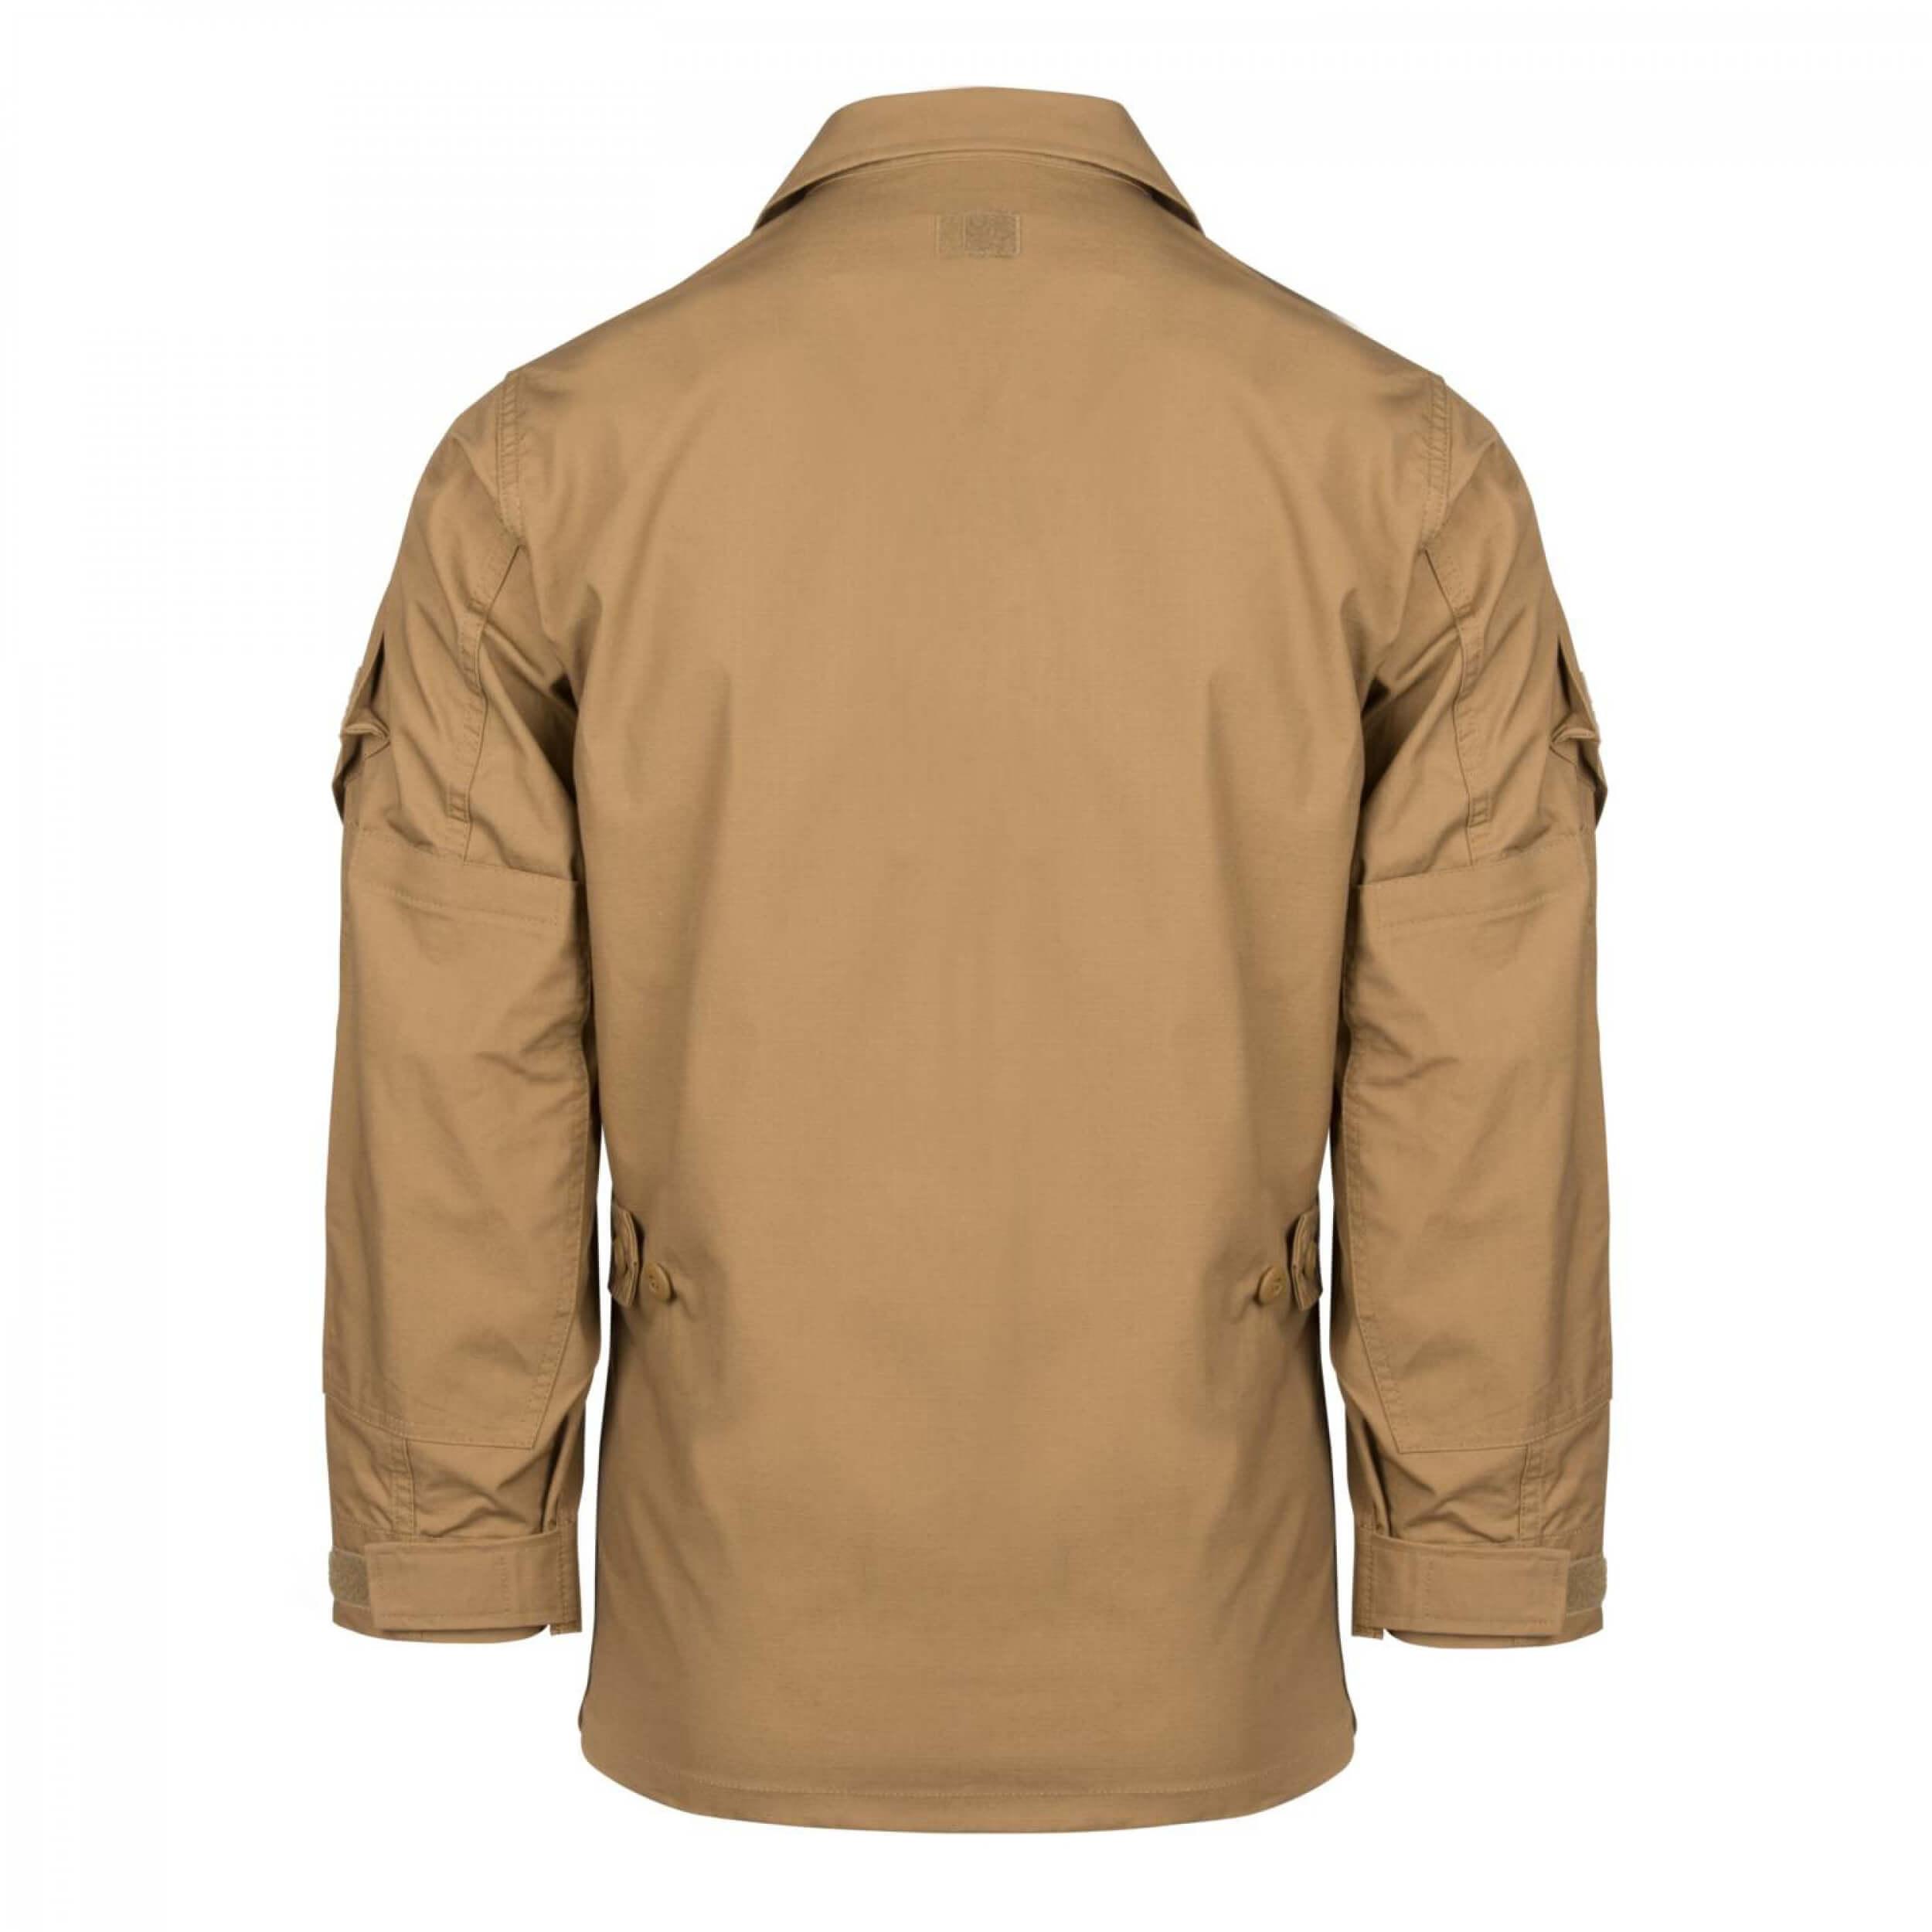 Helikon-Tex SFU Next Shirt - PolyCotton Ripstop - Olive Green